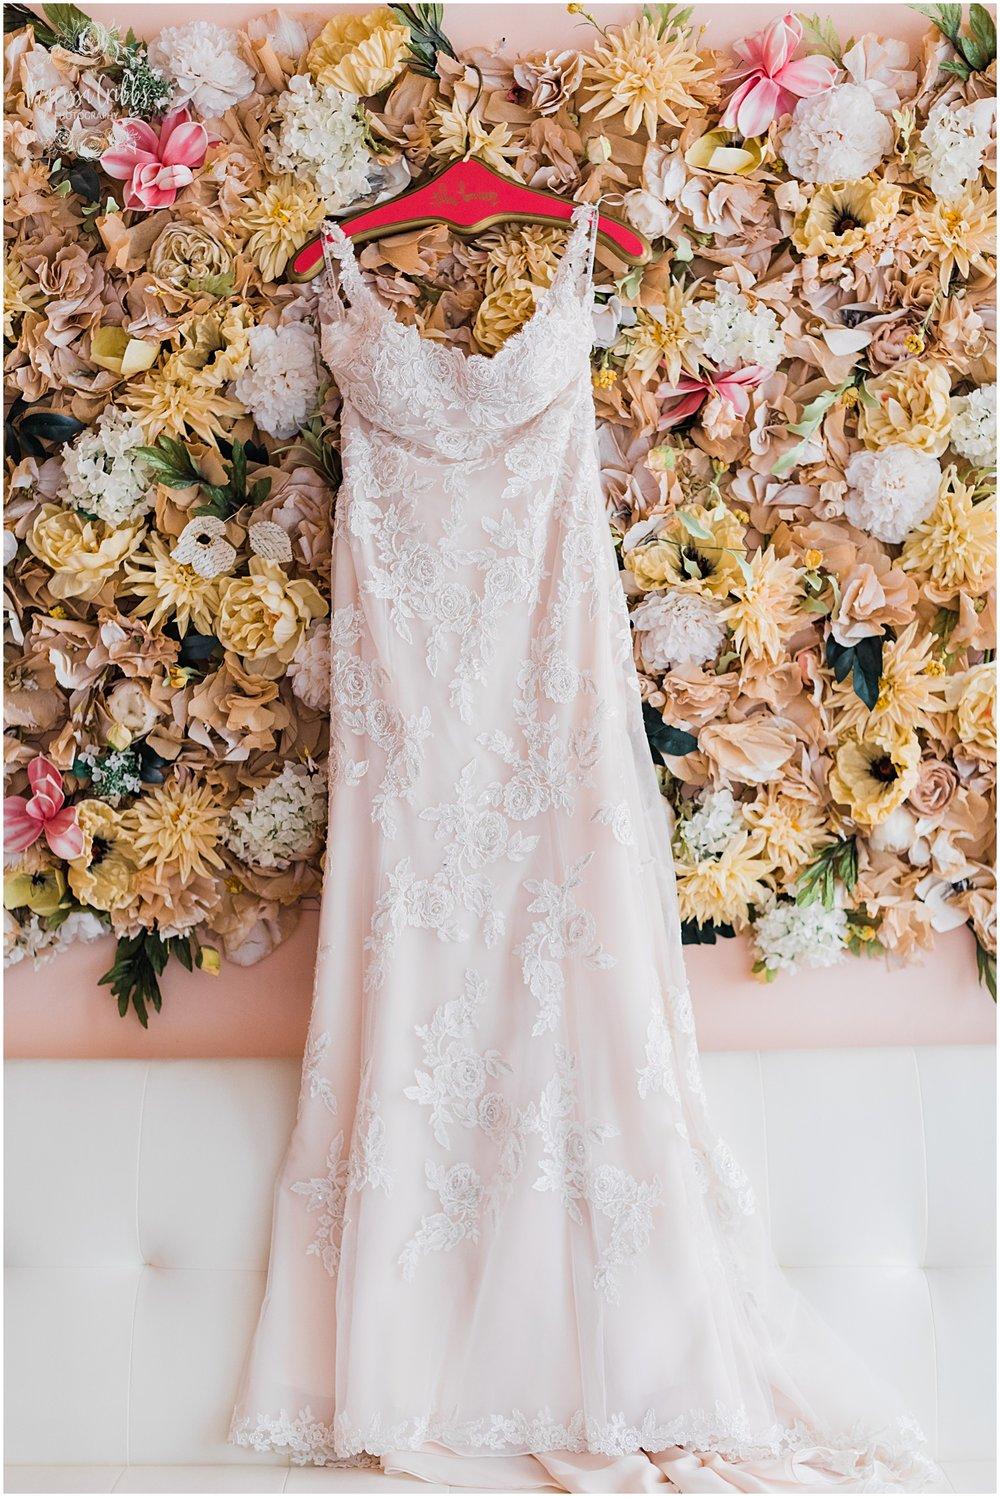 BAUER WEDDING | KELSEA & JUSTIN | MARISSA CRIBBS PHOTOGRAPHY_6484.jpg